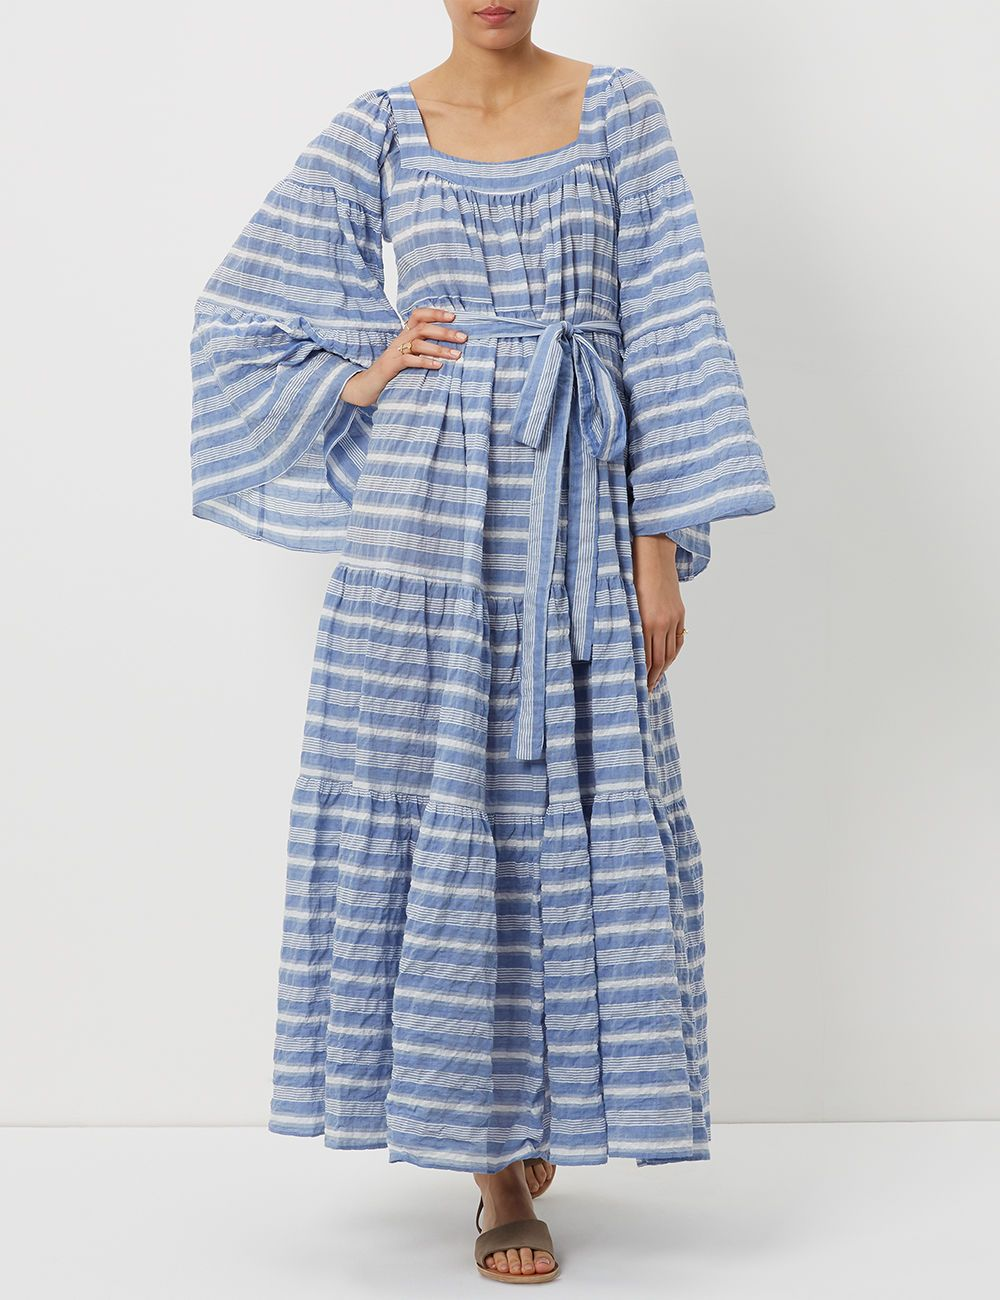 Striped cotton peasant dress Lisa Marie Fernandez X6Odo2dTMQ